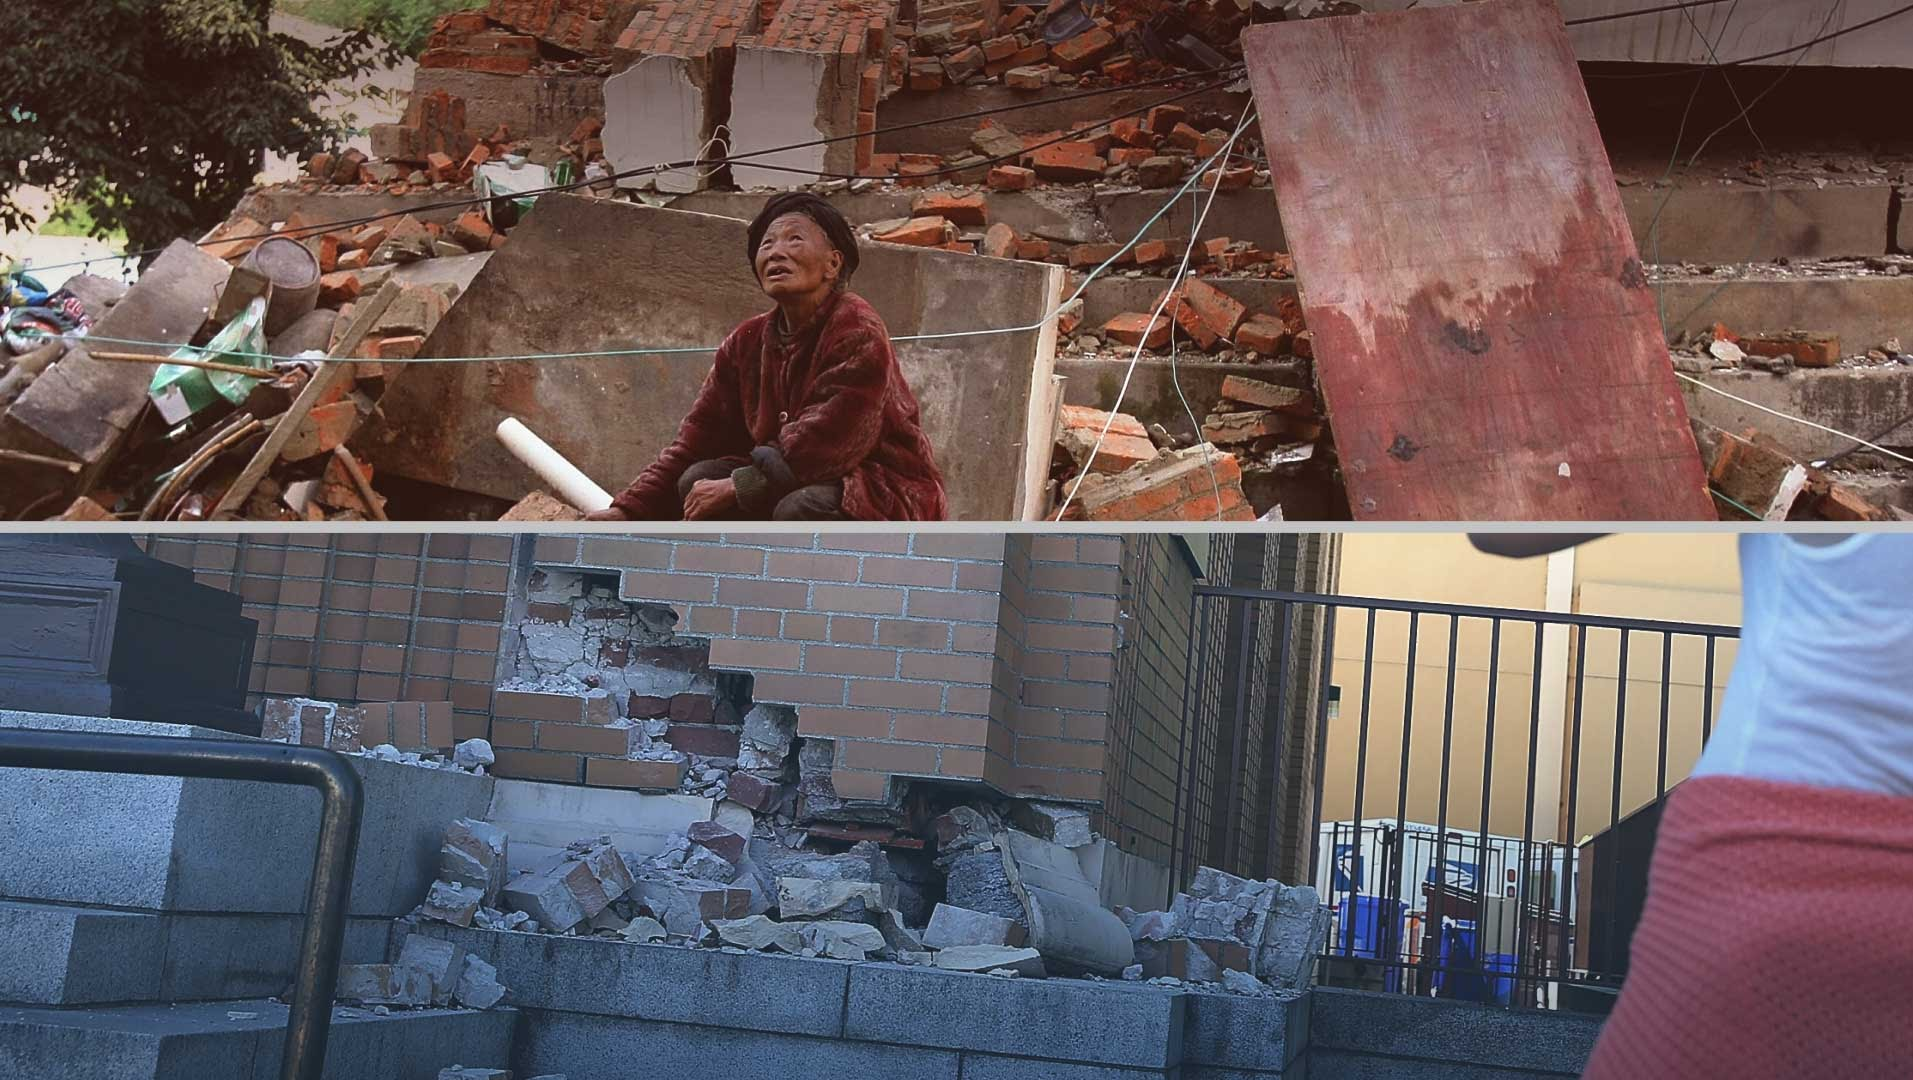 Magnitude-6 Earthquake in China vs California